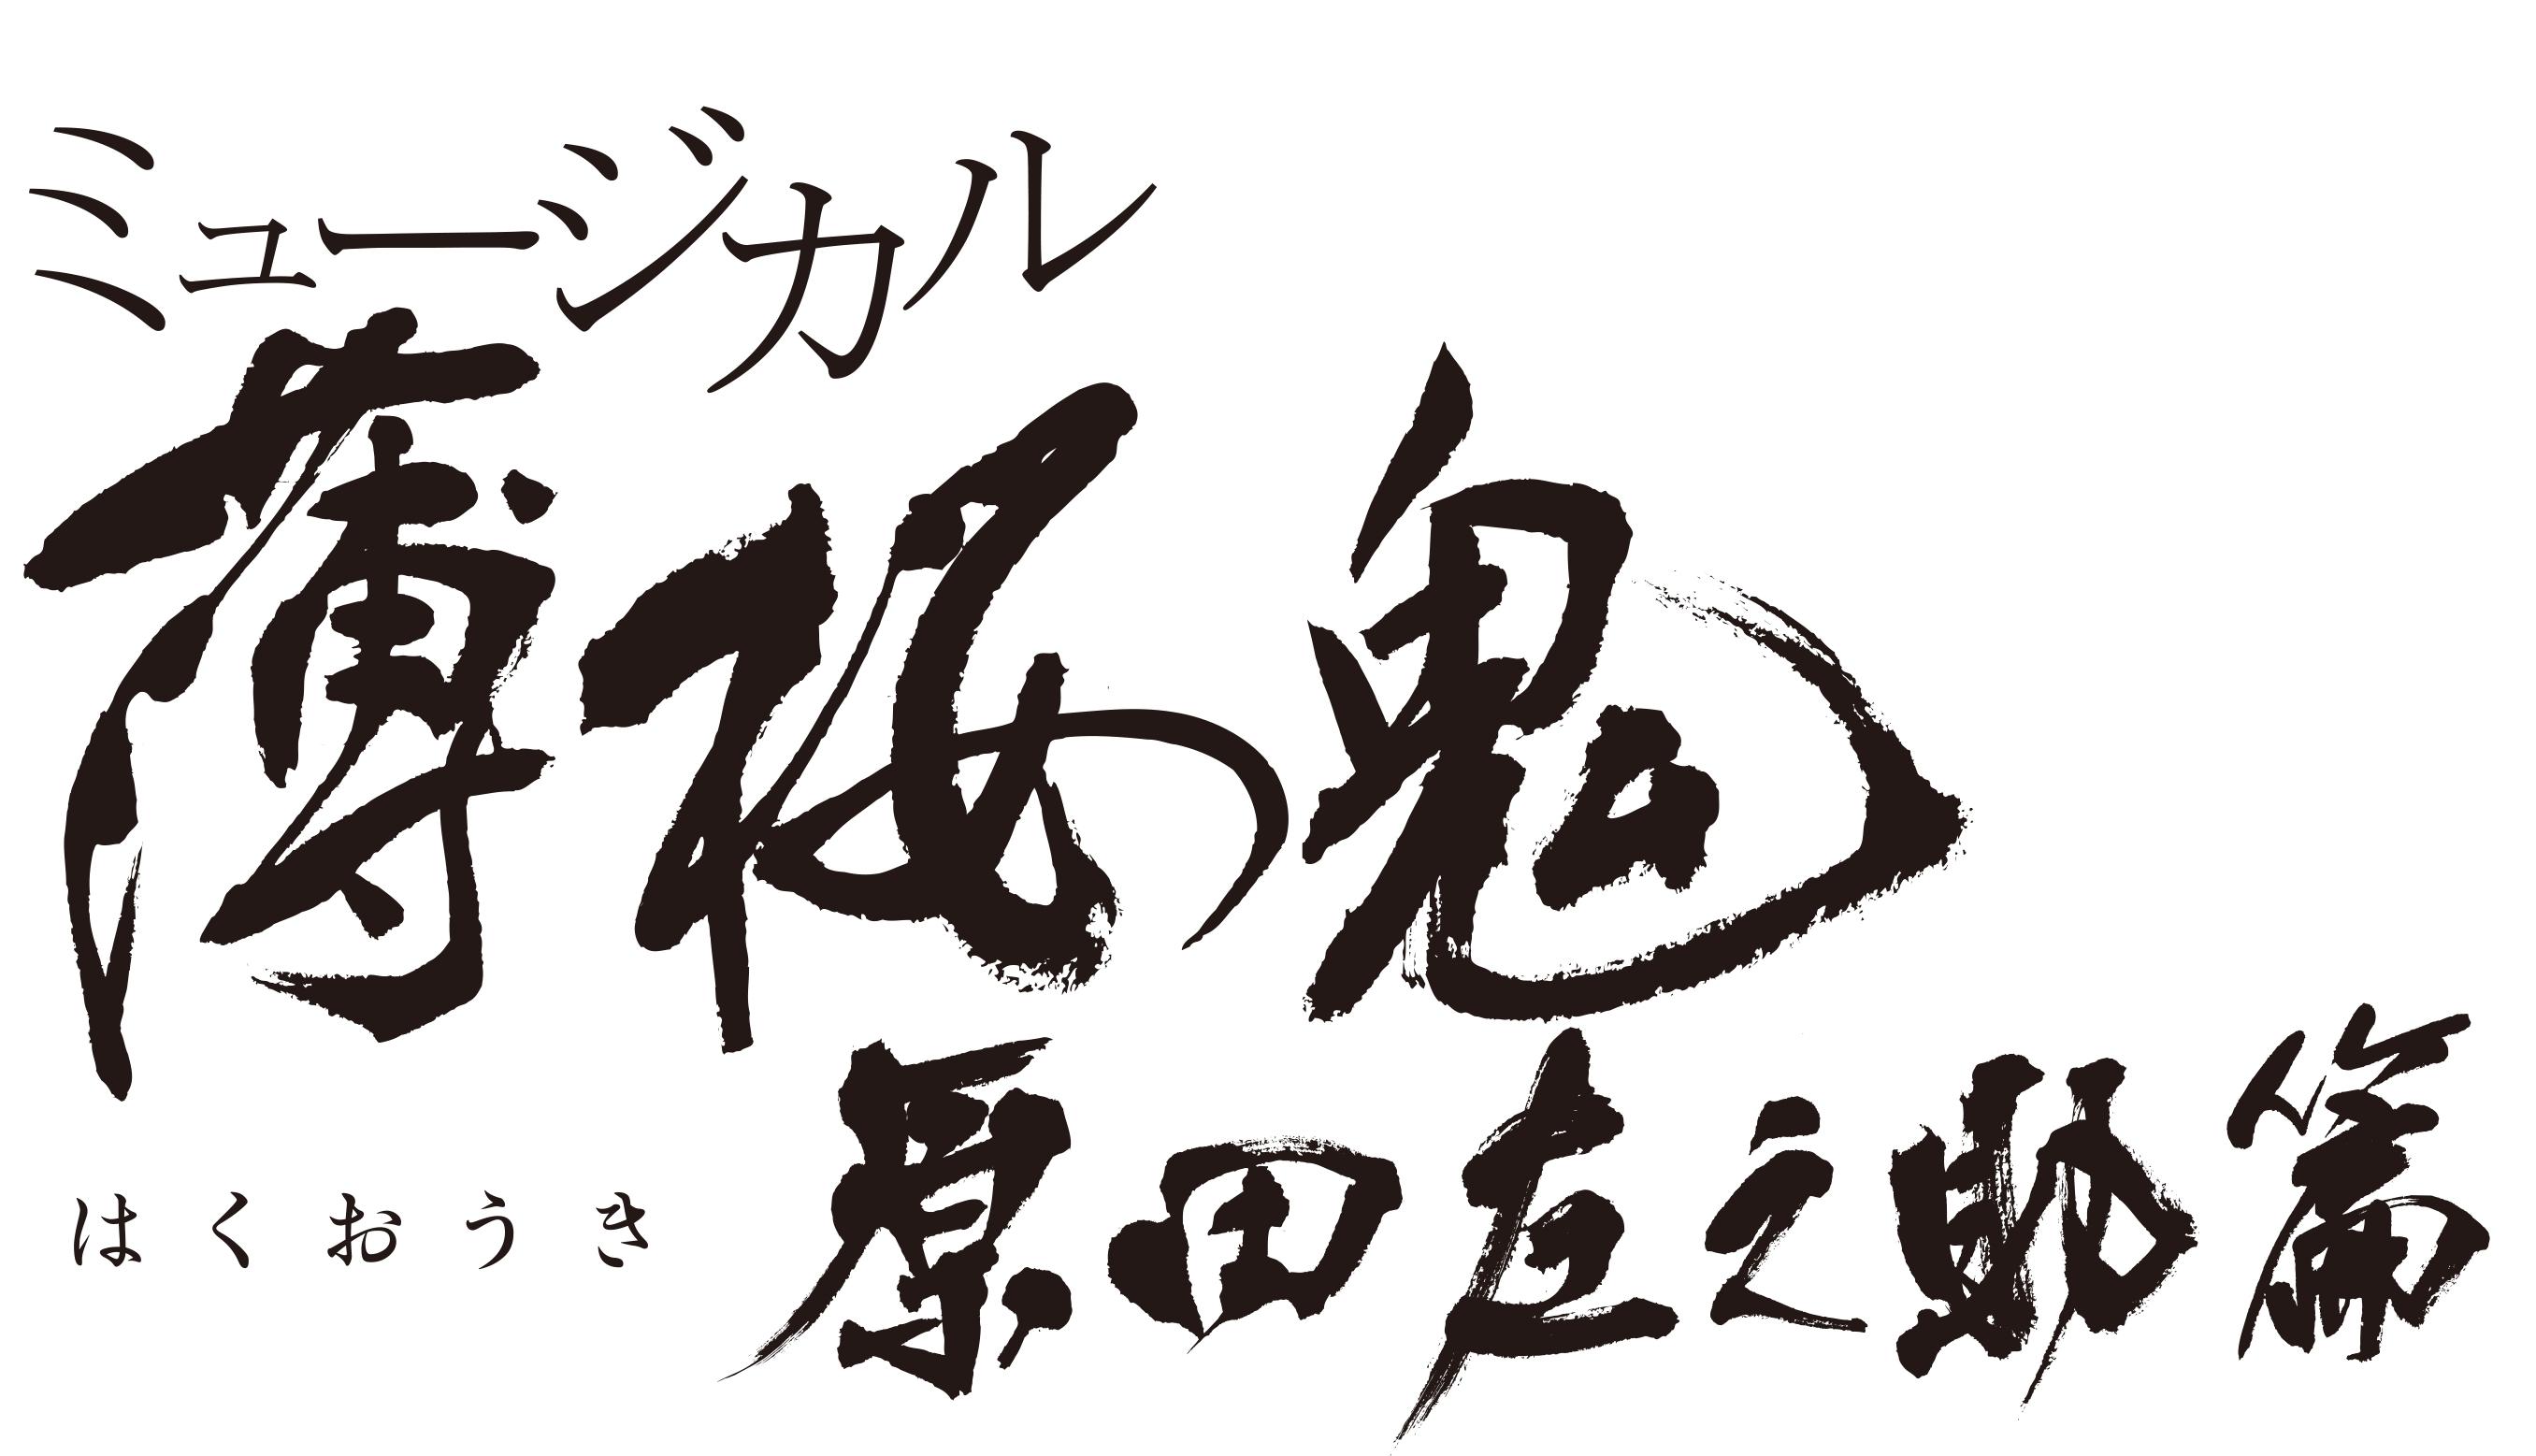 (C)アイディアファクトリー・デザインファクトリー/「薄桜鬼」製作委員会 (C)ミュージカル『薄桜鬼』製作委員会